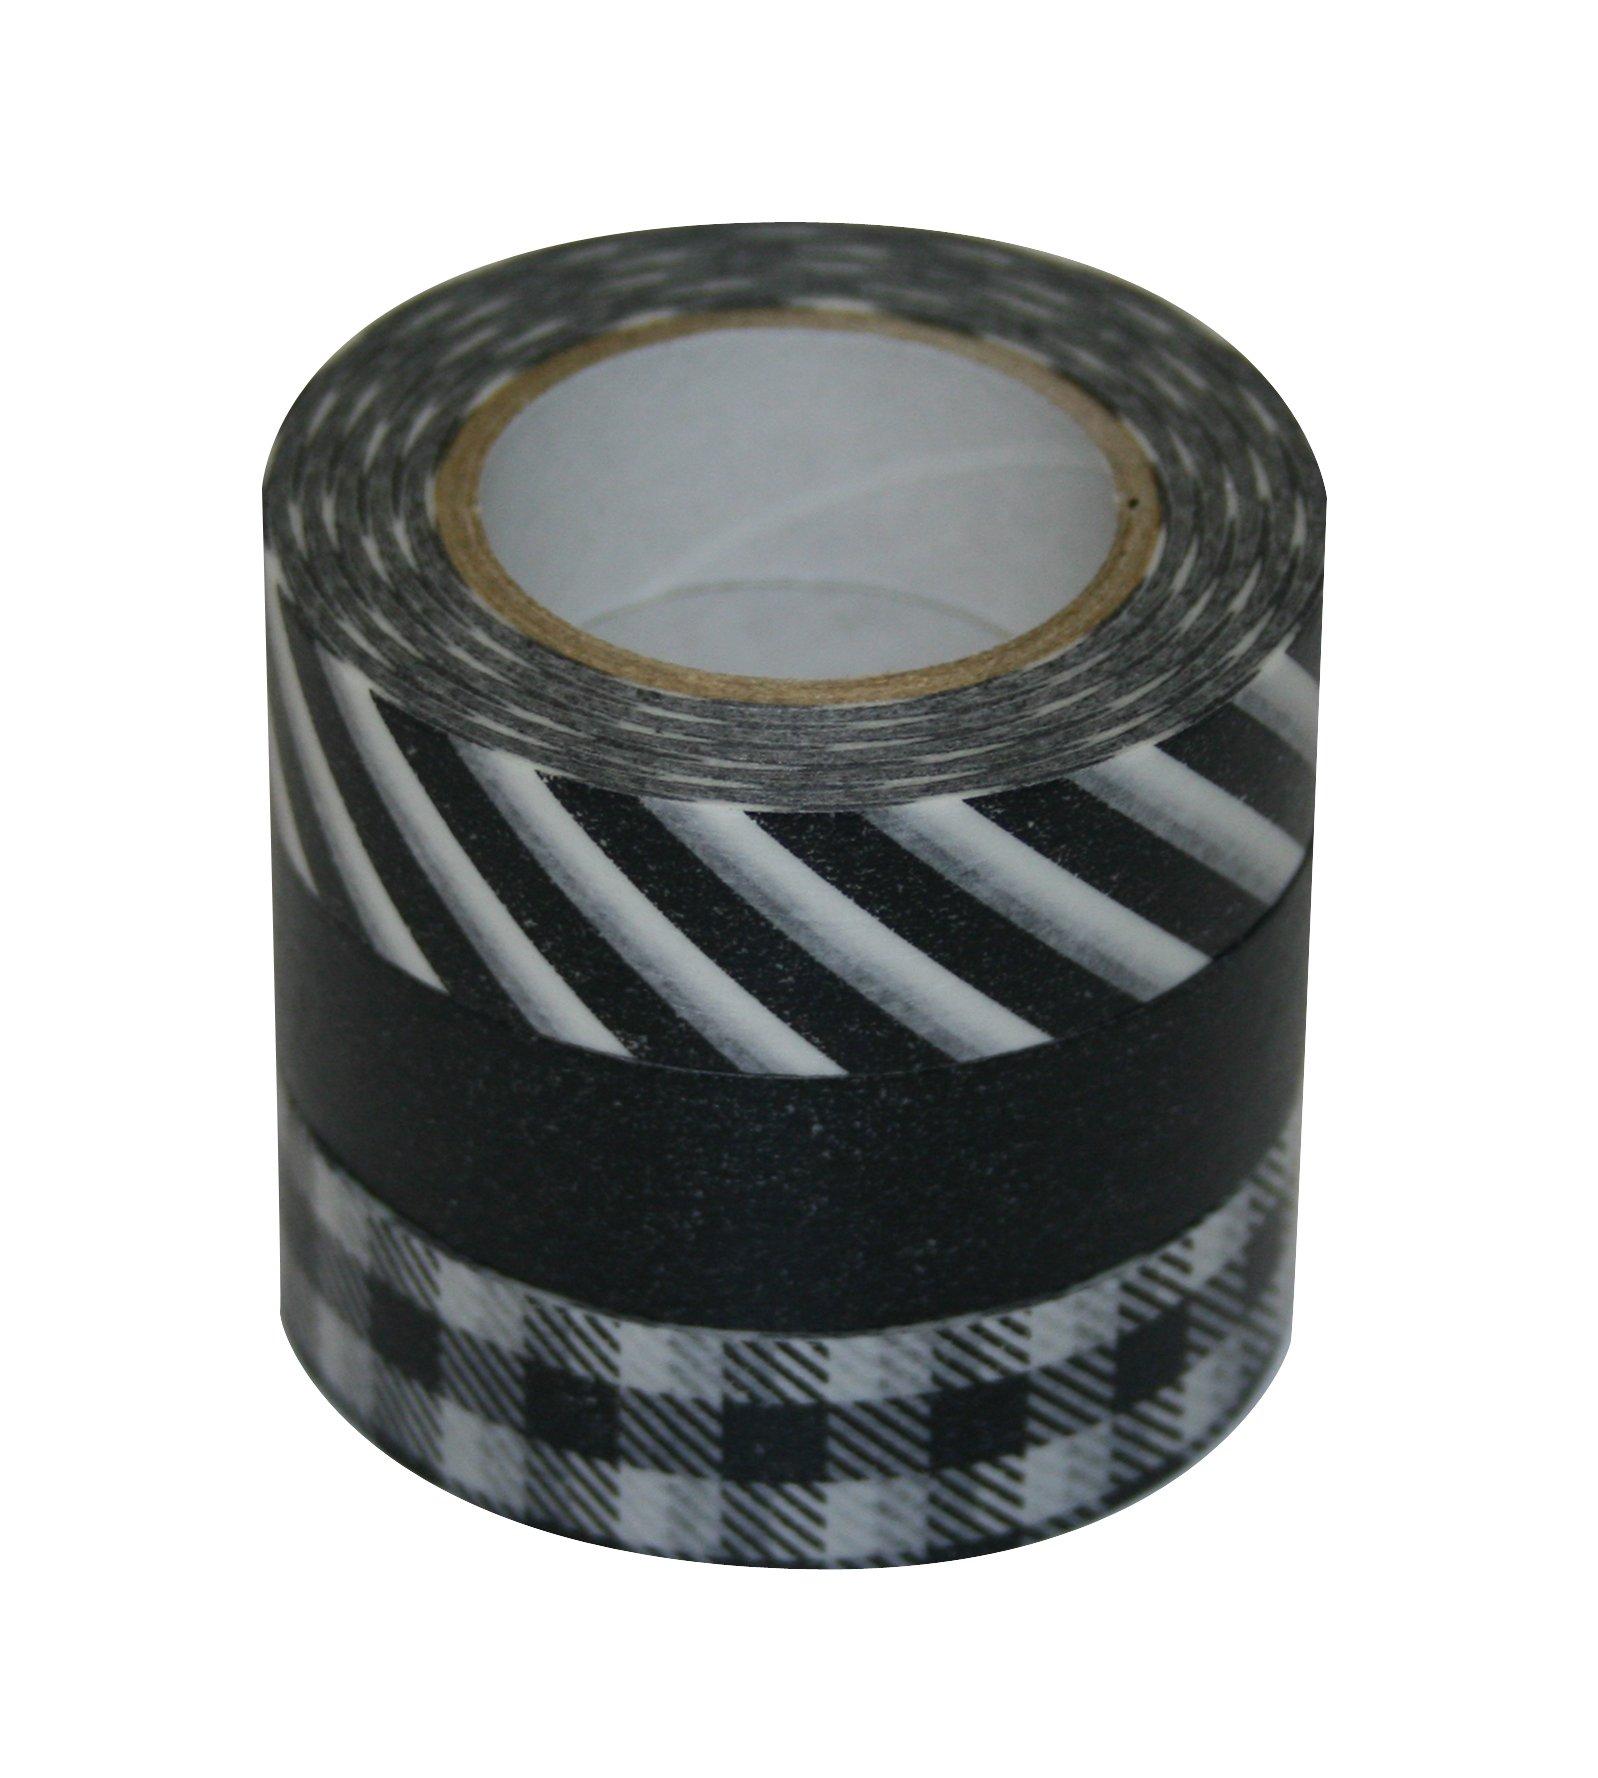 DŽcor Washi Tape 3 Piece Set: Black Stripe, Black Plain, Black Check